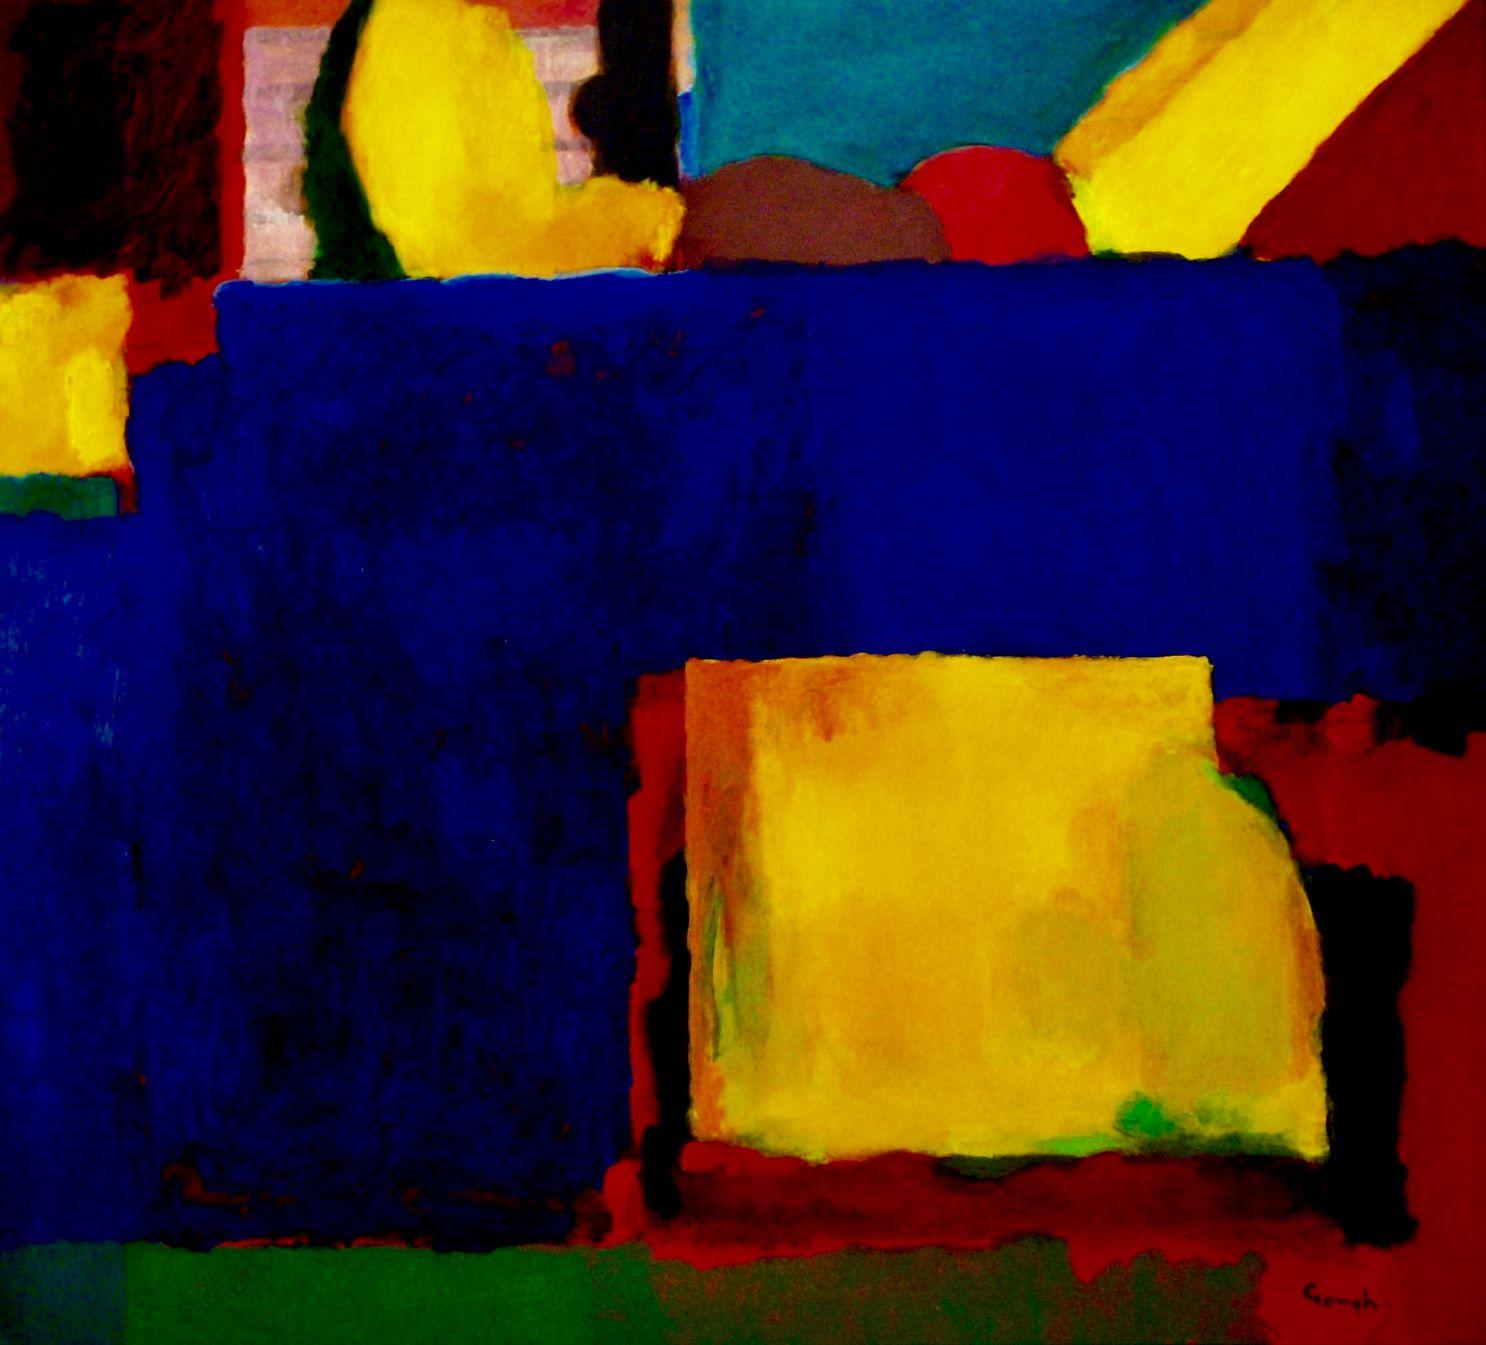 ' Primary Garden Craig Gough, Construct on Blue Field'. 2019. acrylic on canvas. 152x167cm $12,000 - enquire